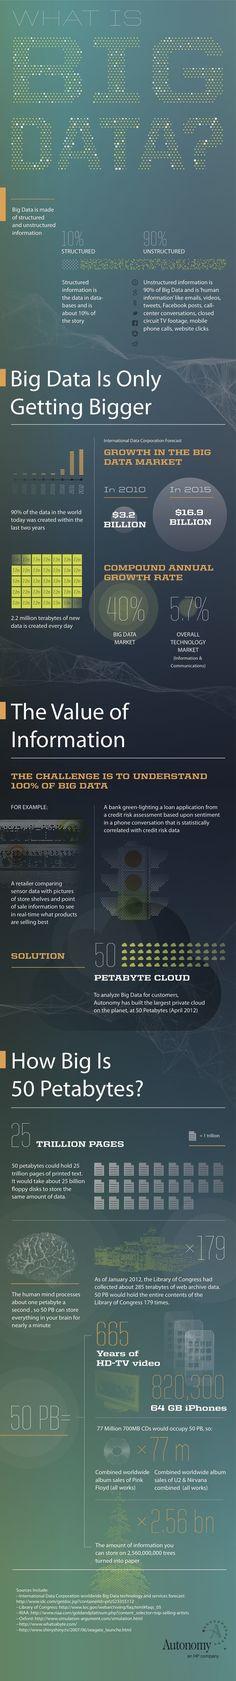 Big #data is getting bigger!